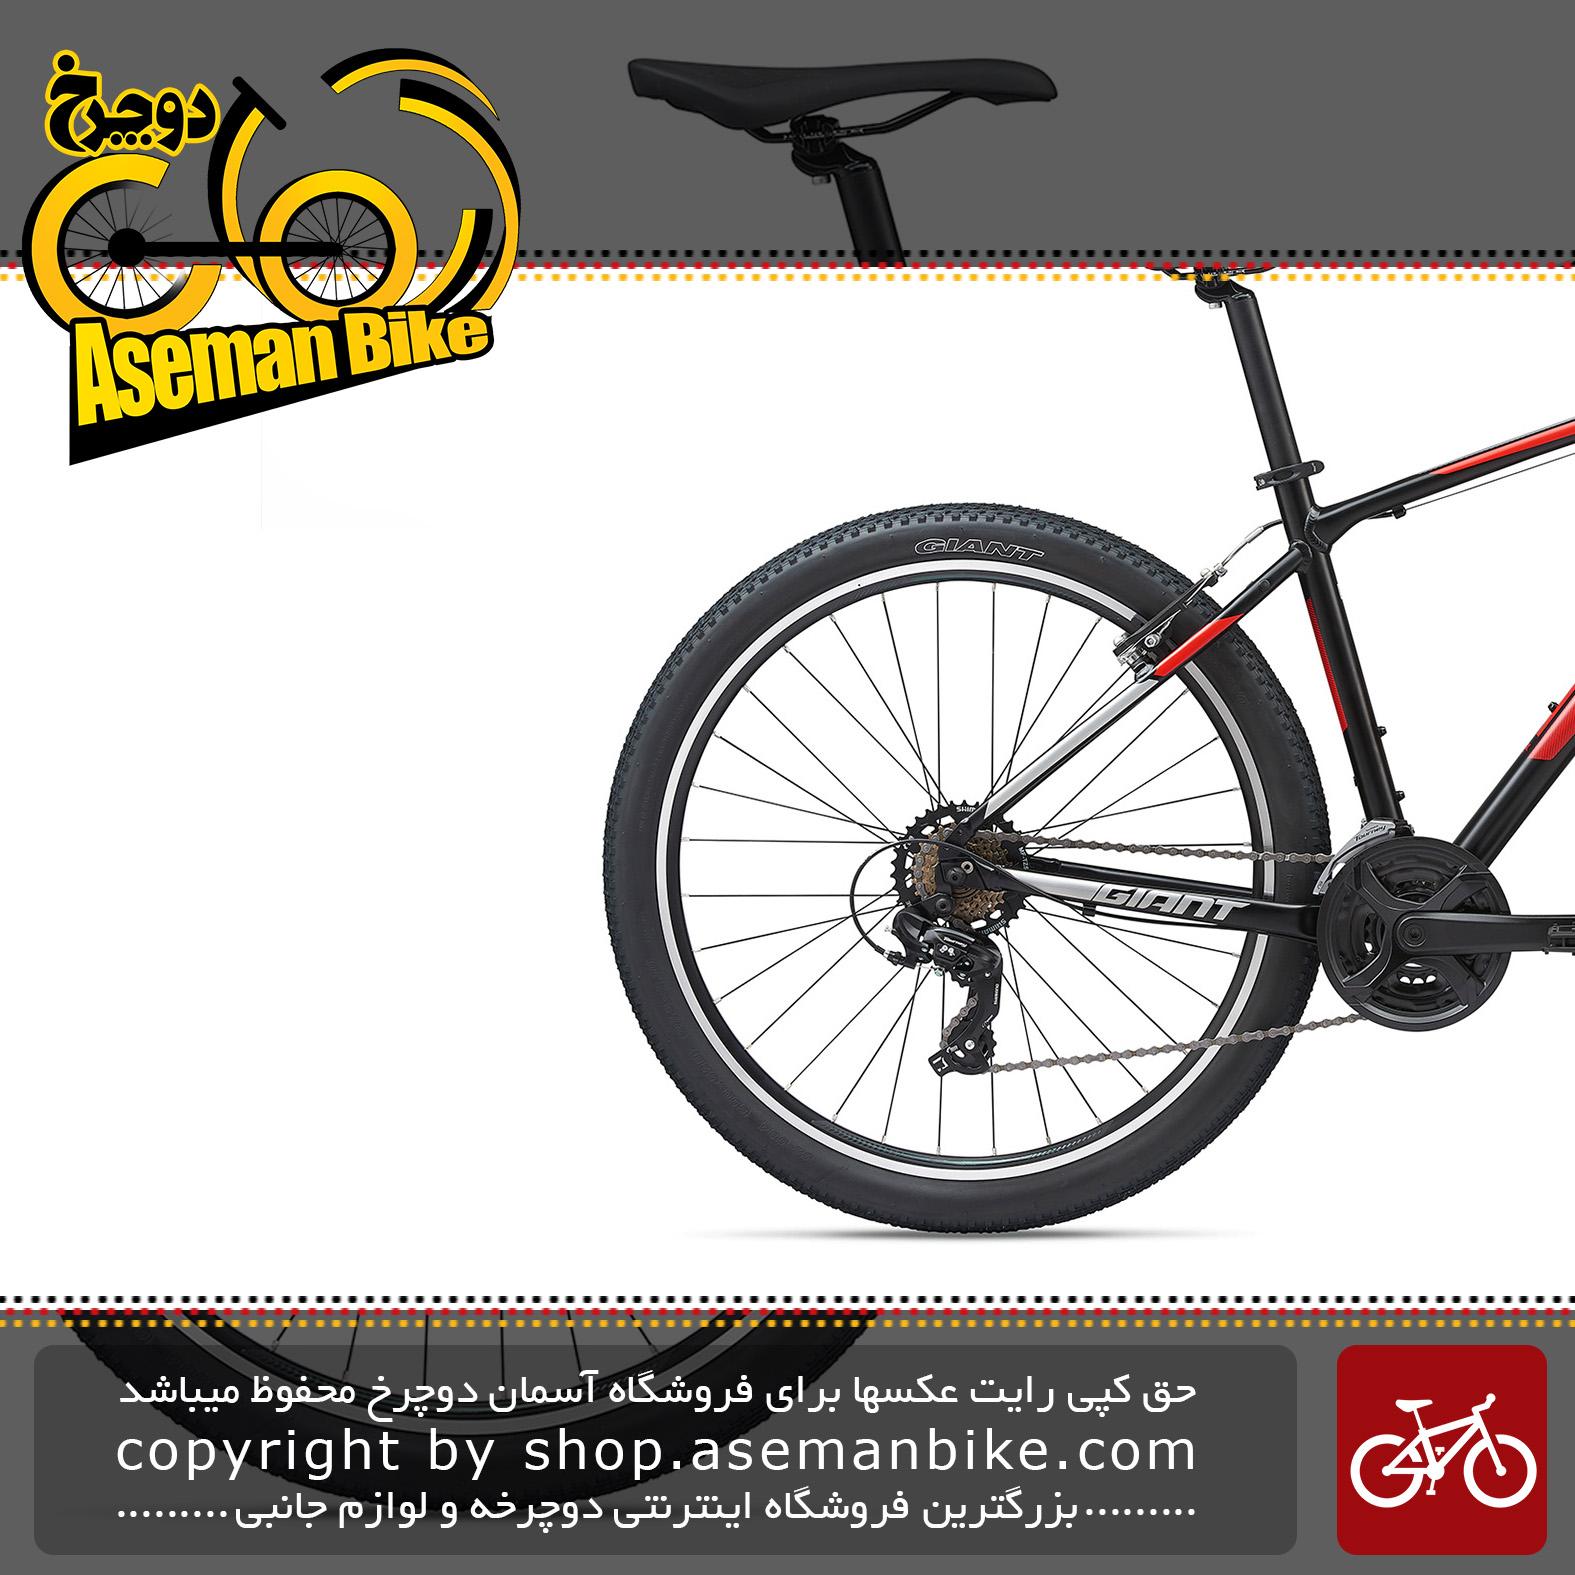 دوچرخه کوهستان جاینت مدل ای تی ایکس 3 (جی ای) 2020 Giant Mountain Bicycle ATX 3 (GE) 2020